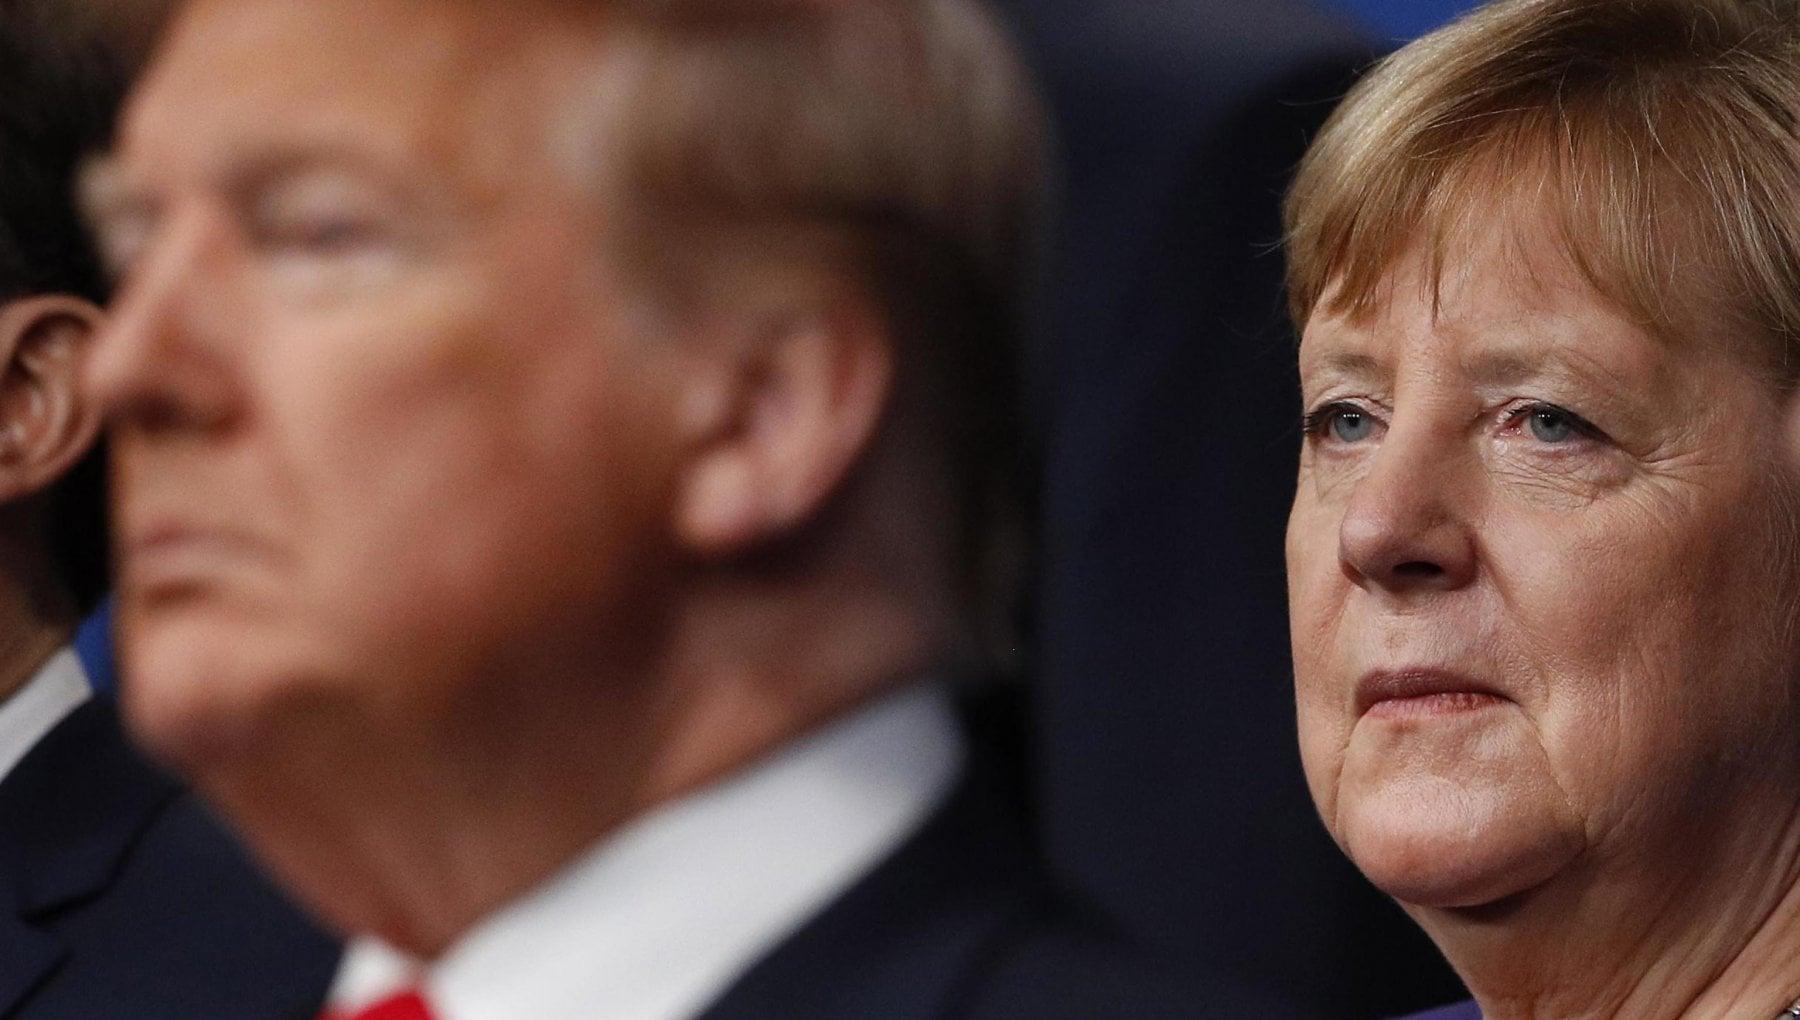 Merkel sul blocco di Twitter a Trump Chiusura problematica